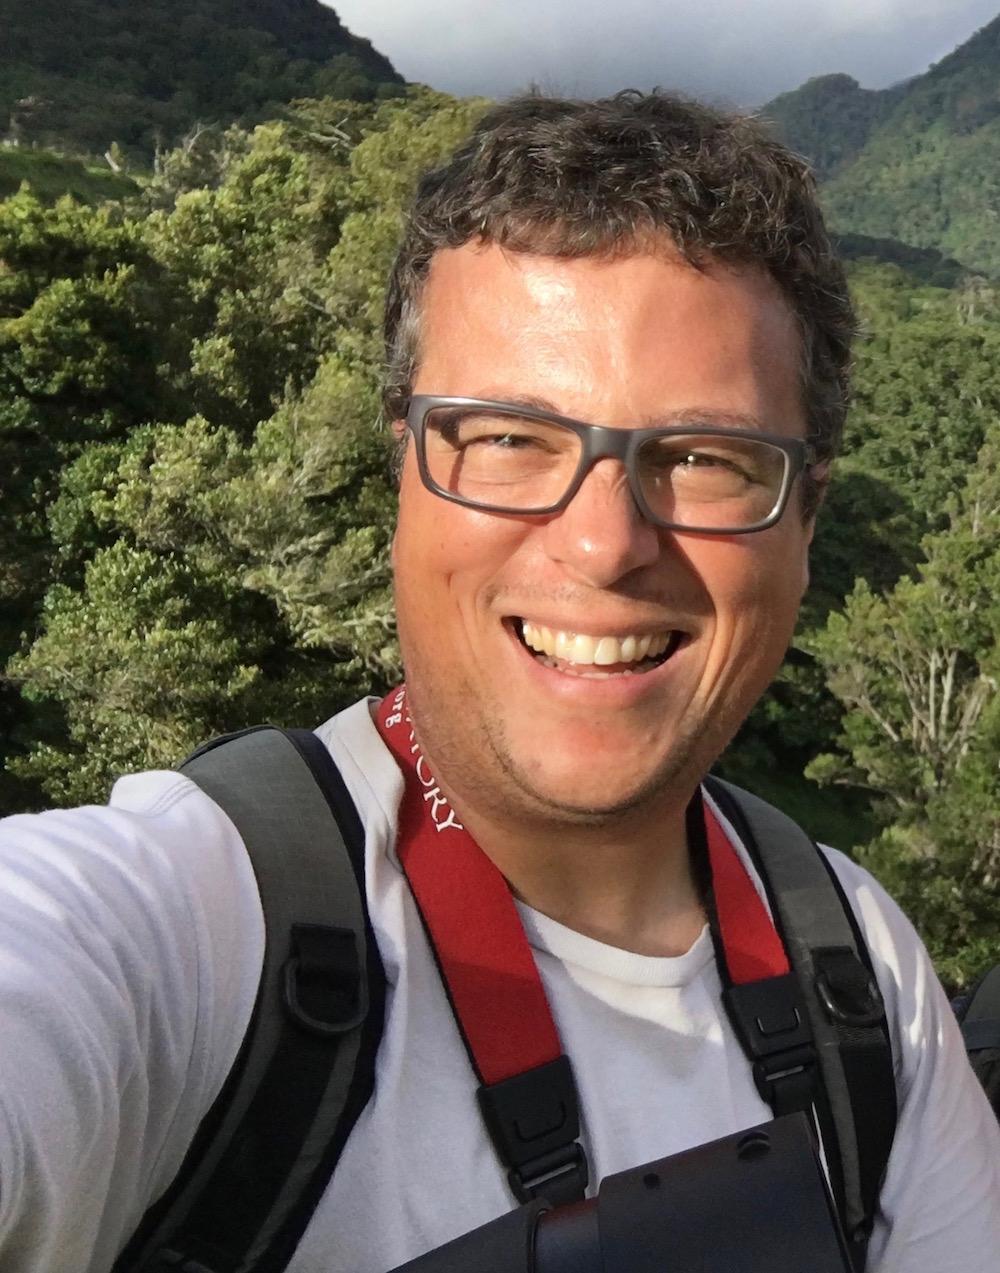 David La Puma